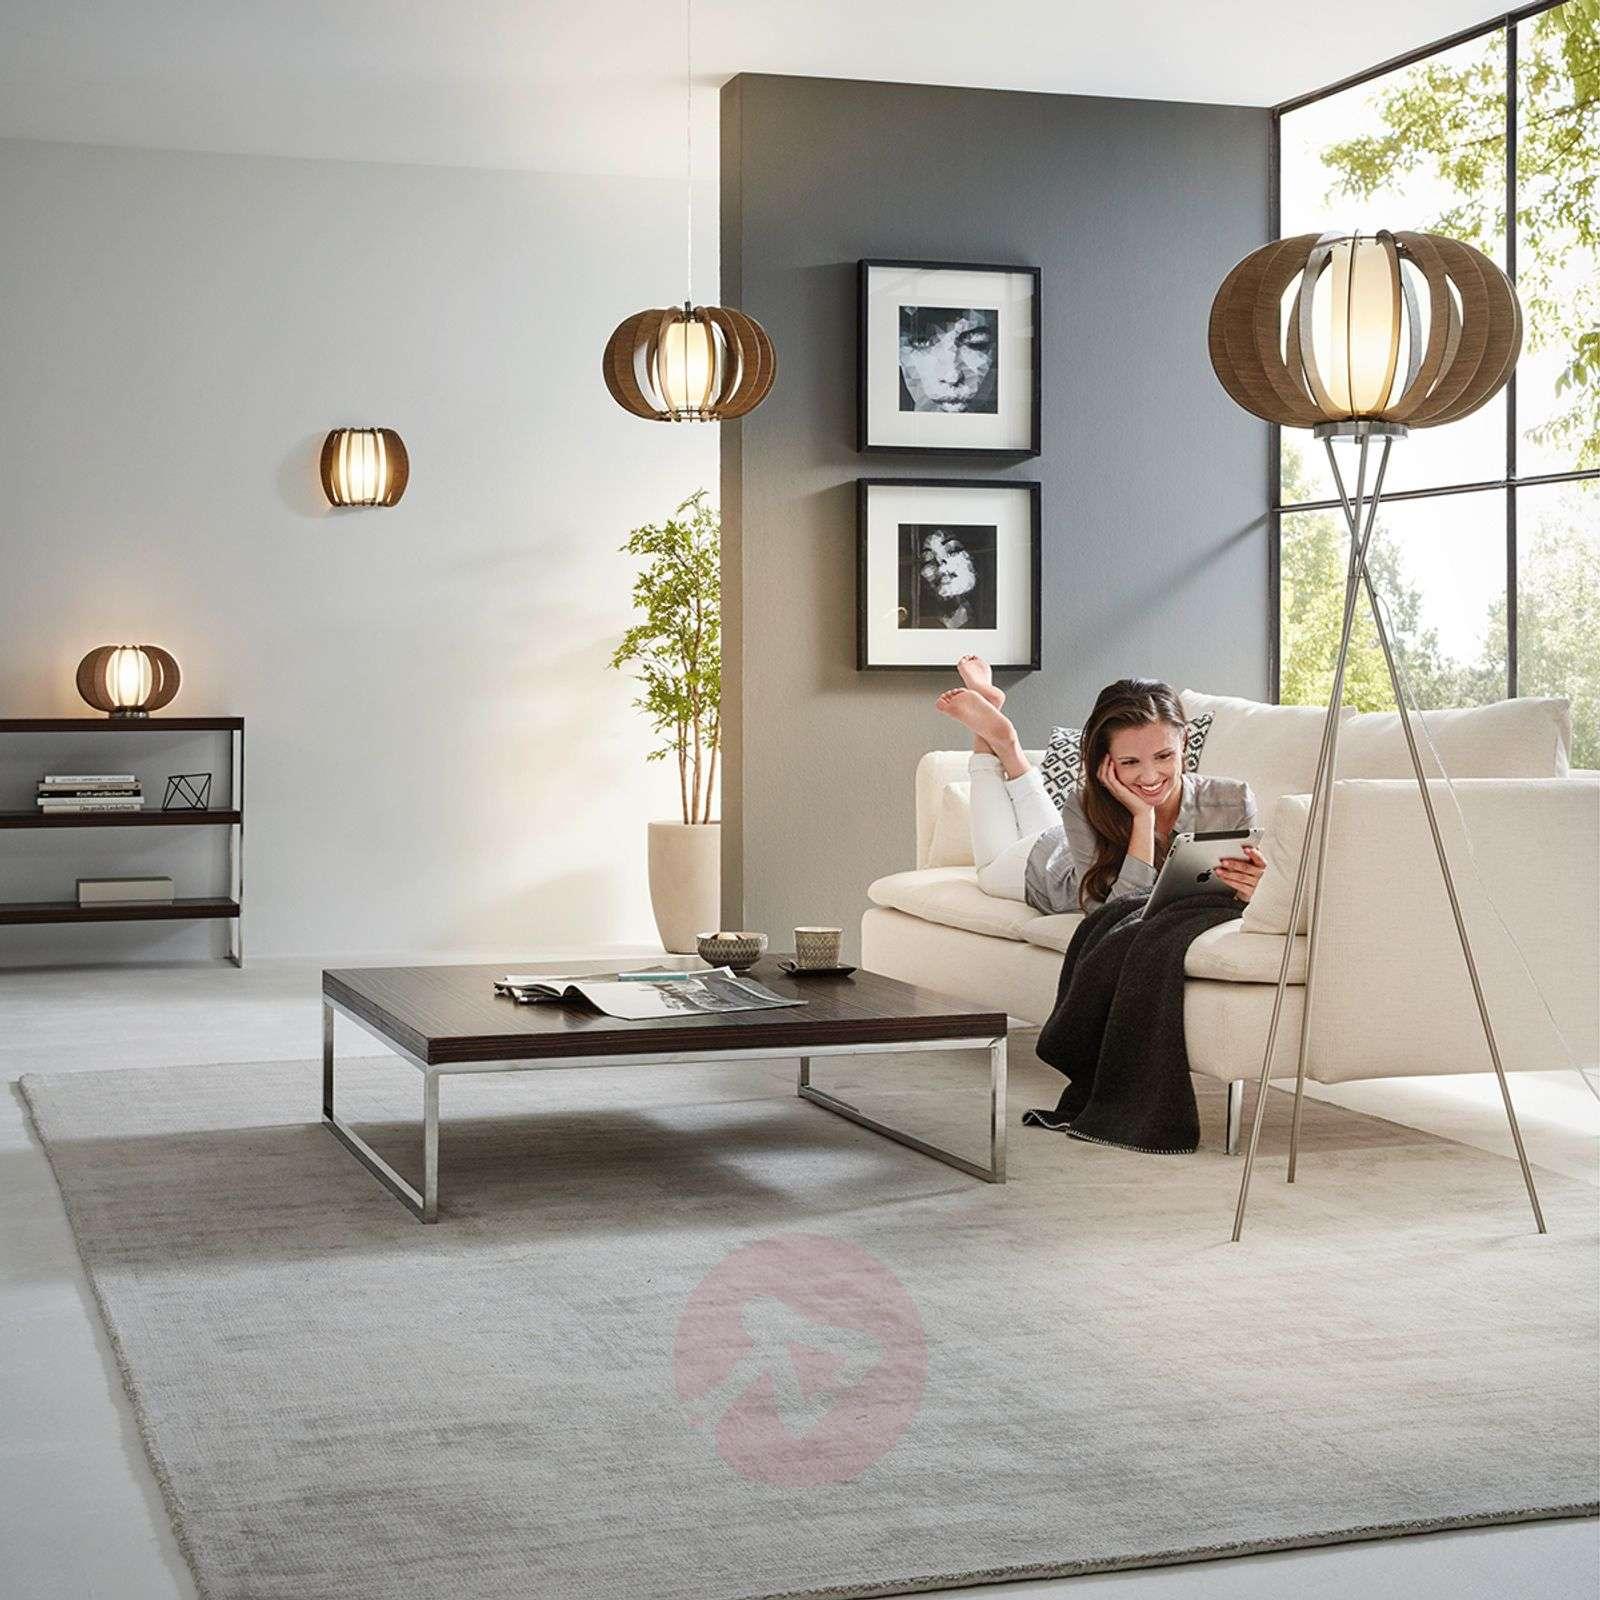 Effective Stellato floor lamp with wooden slats-3031907-01